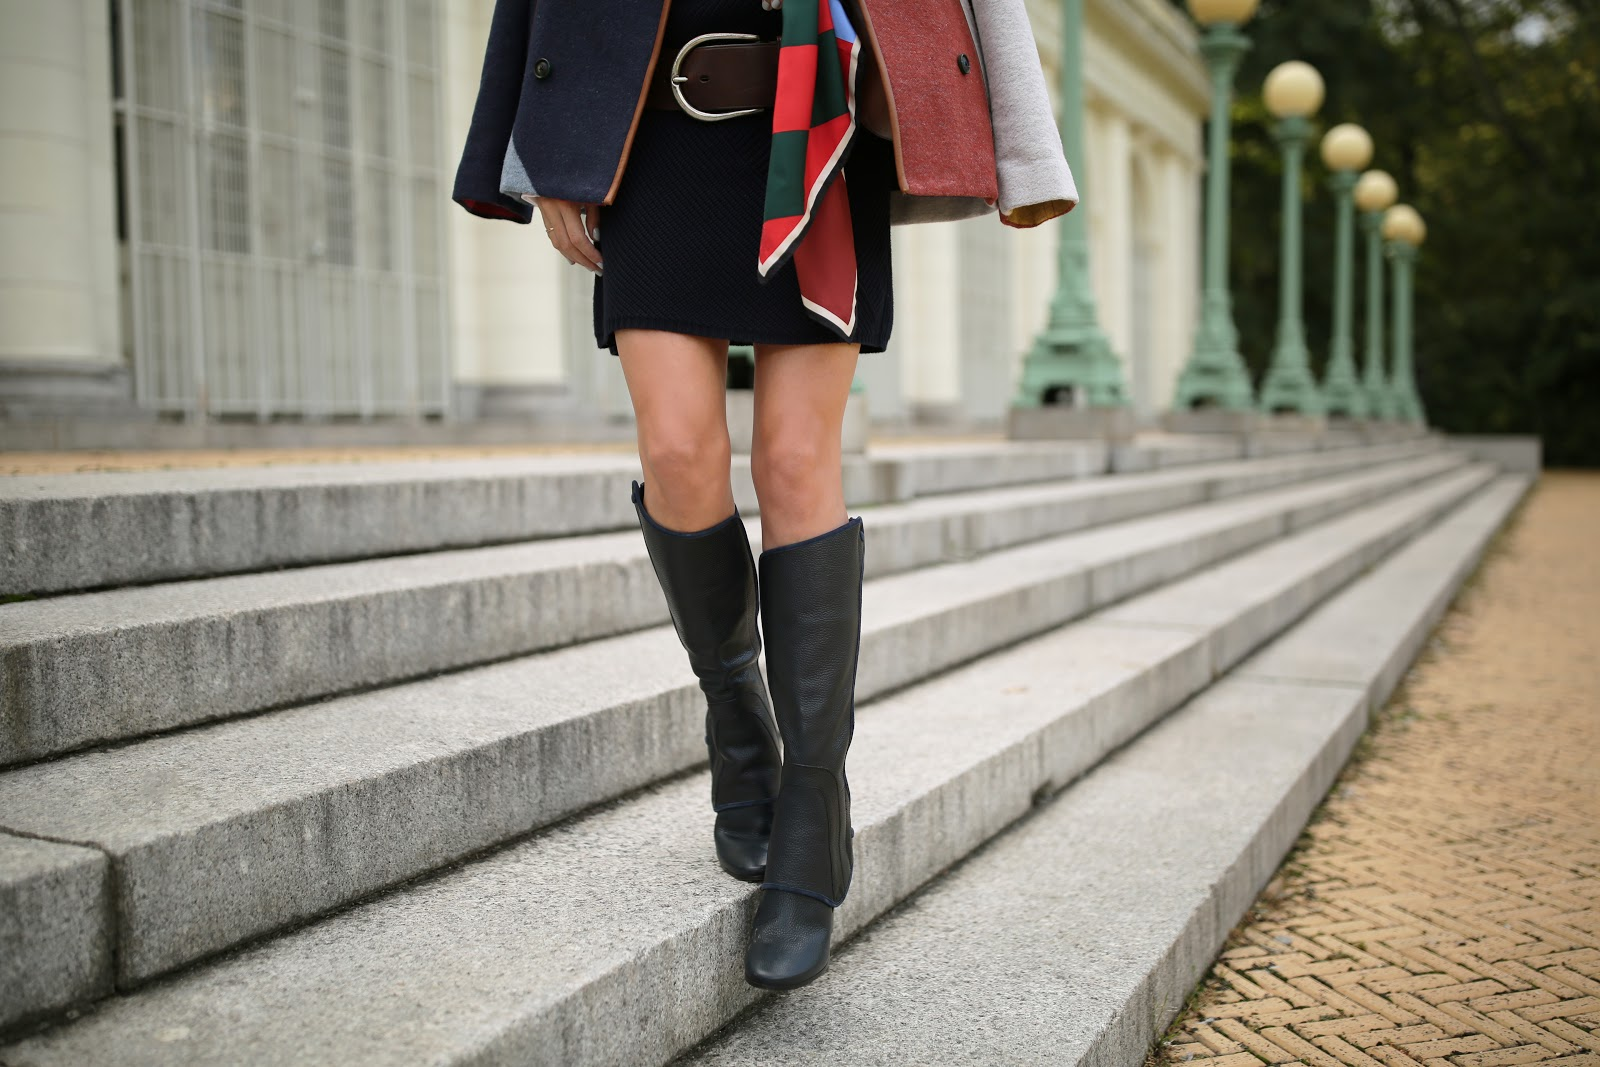 a5045e2ba74 Boots: Tory Burch Waterbury Convertible Boot (see my other Tory Burch boot  picks below). Sweater Dress: Tory Burch Brodie Tunic Dress.